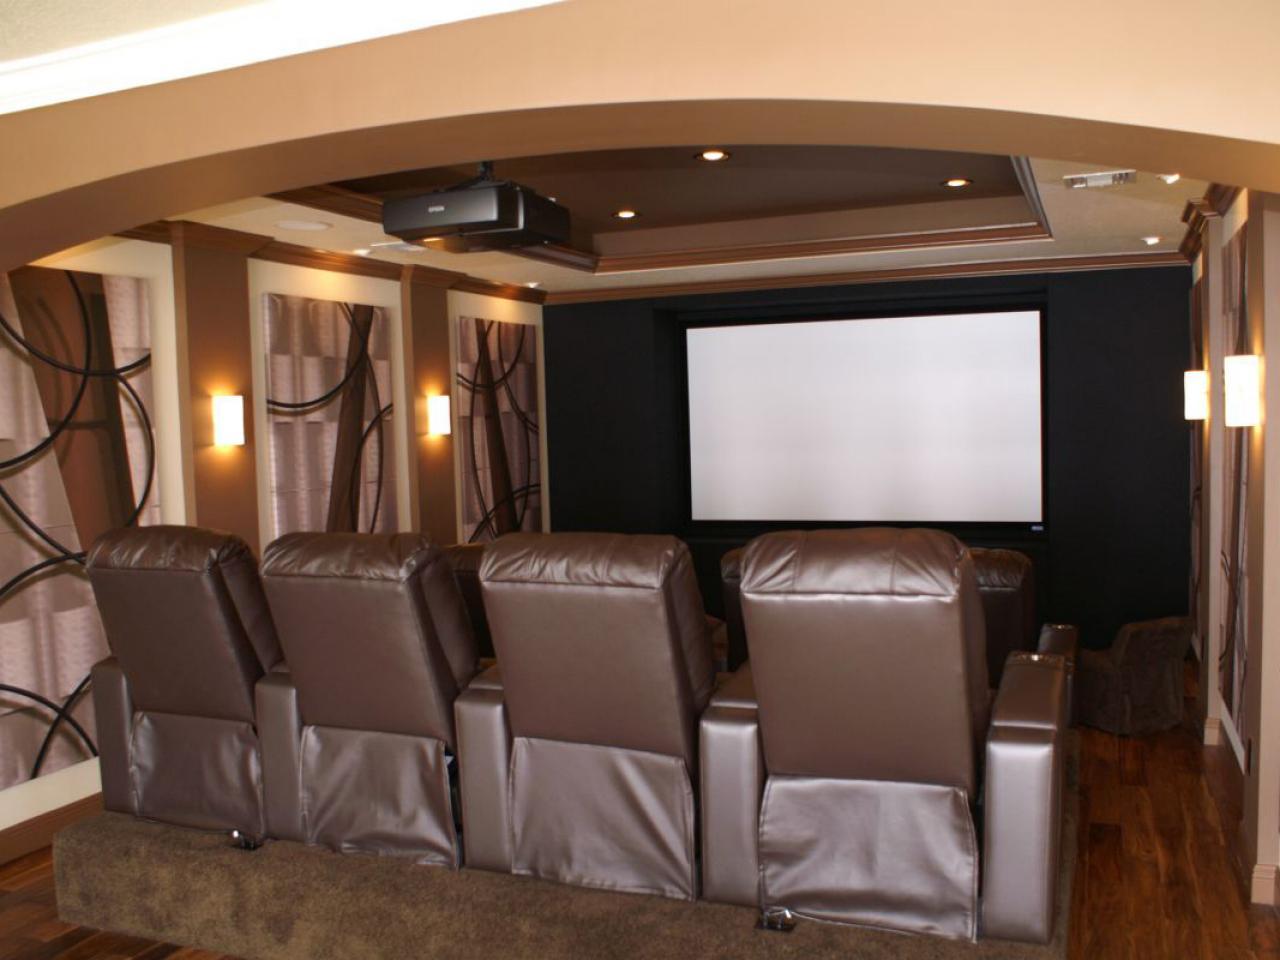 poltrone-massaggianti-sala-cinema